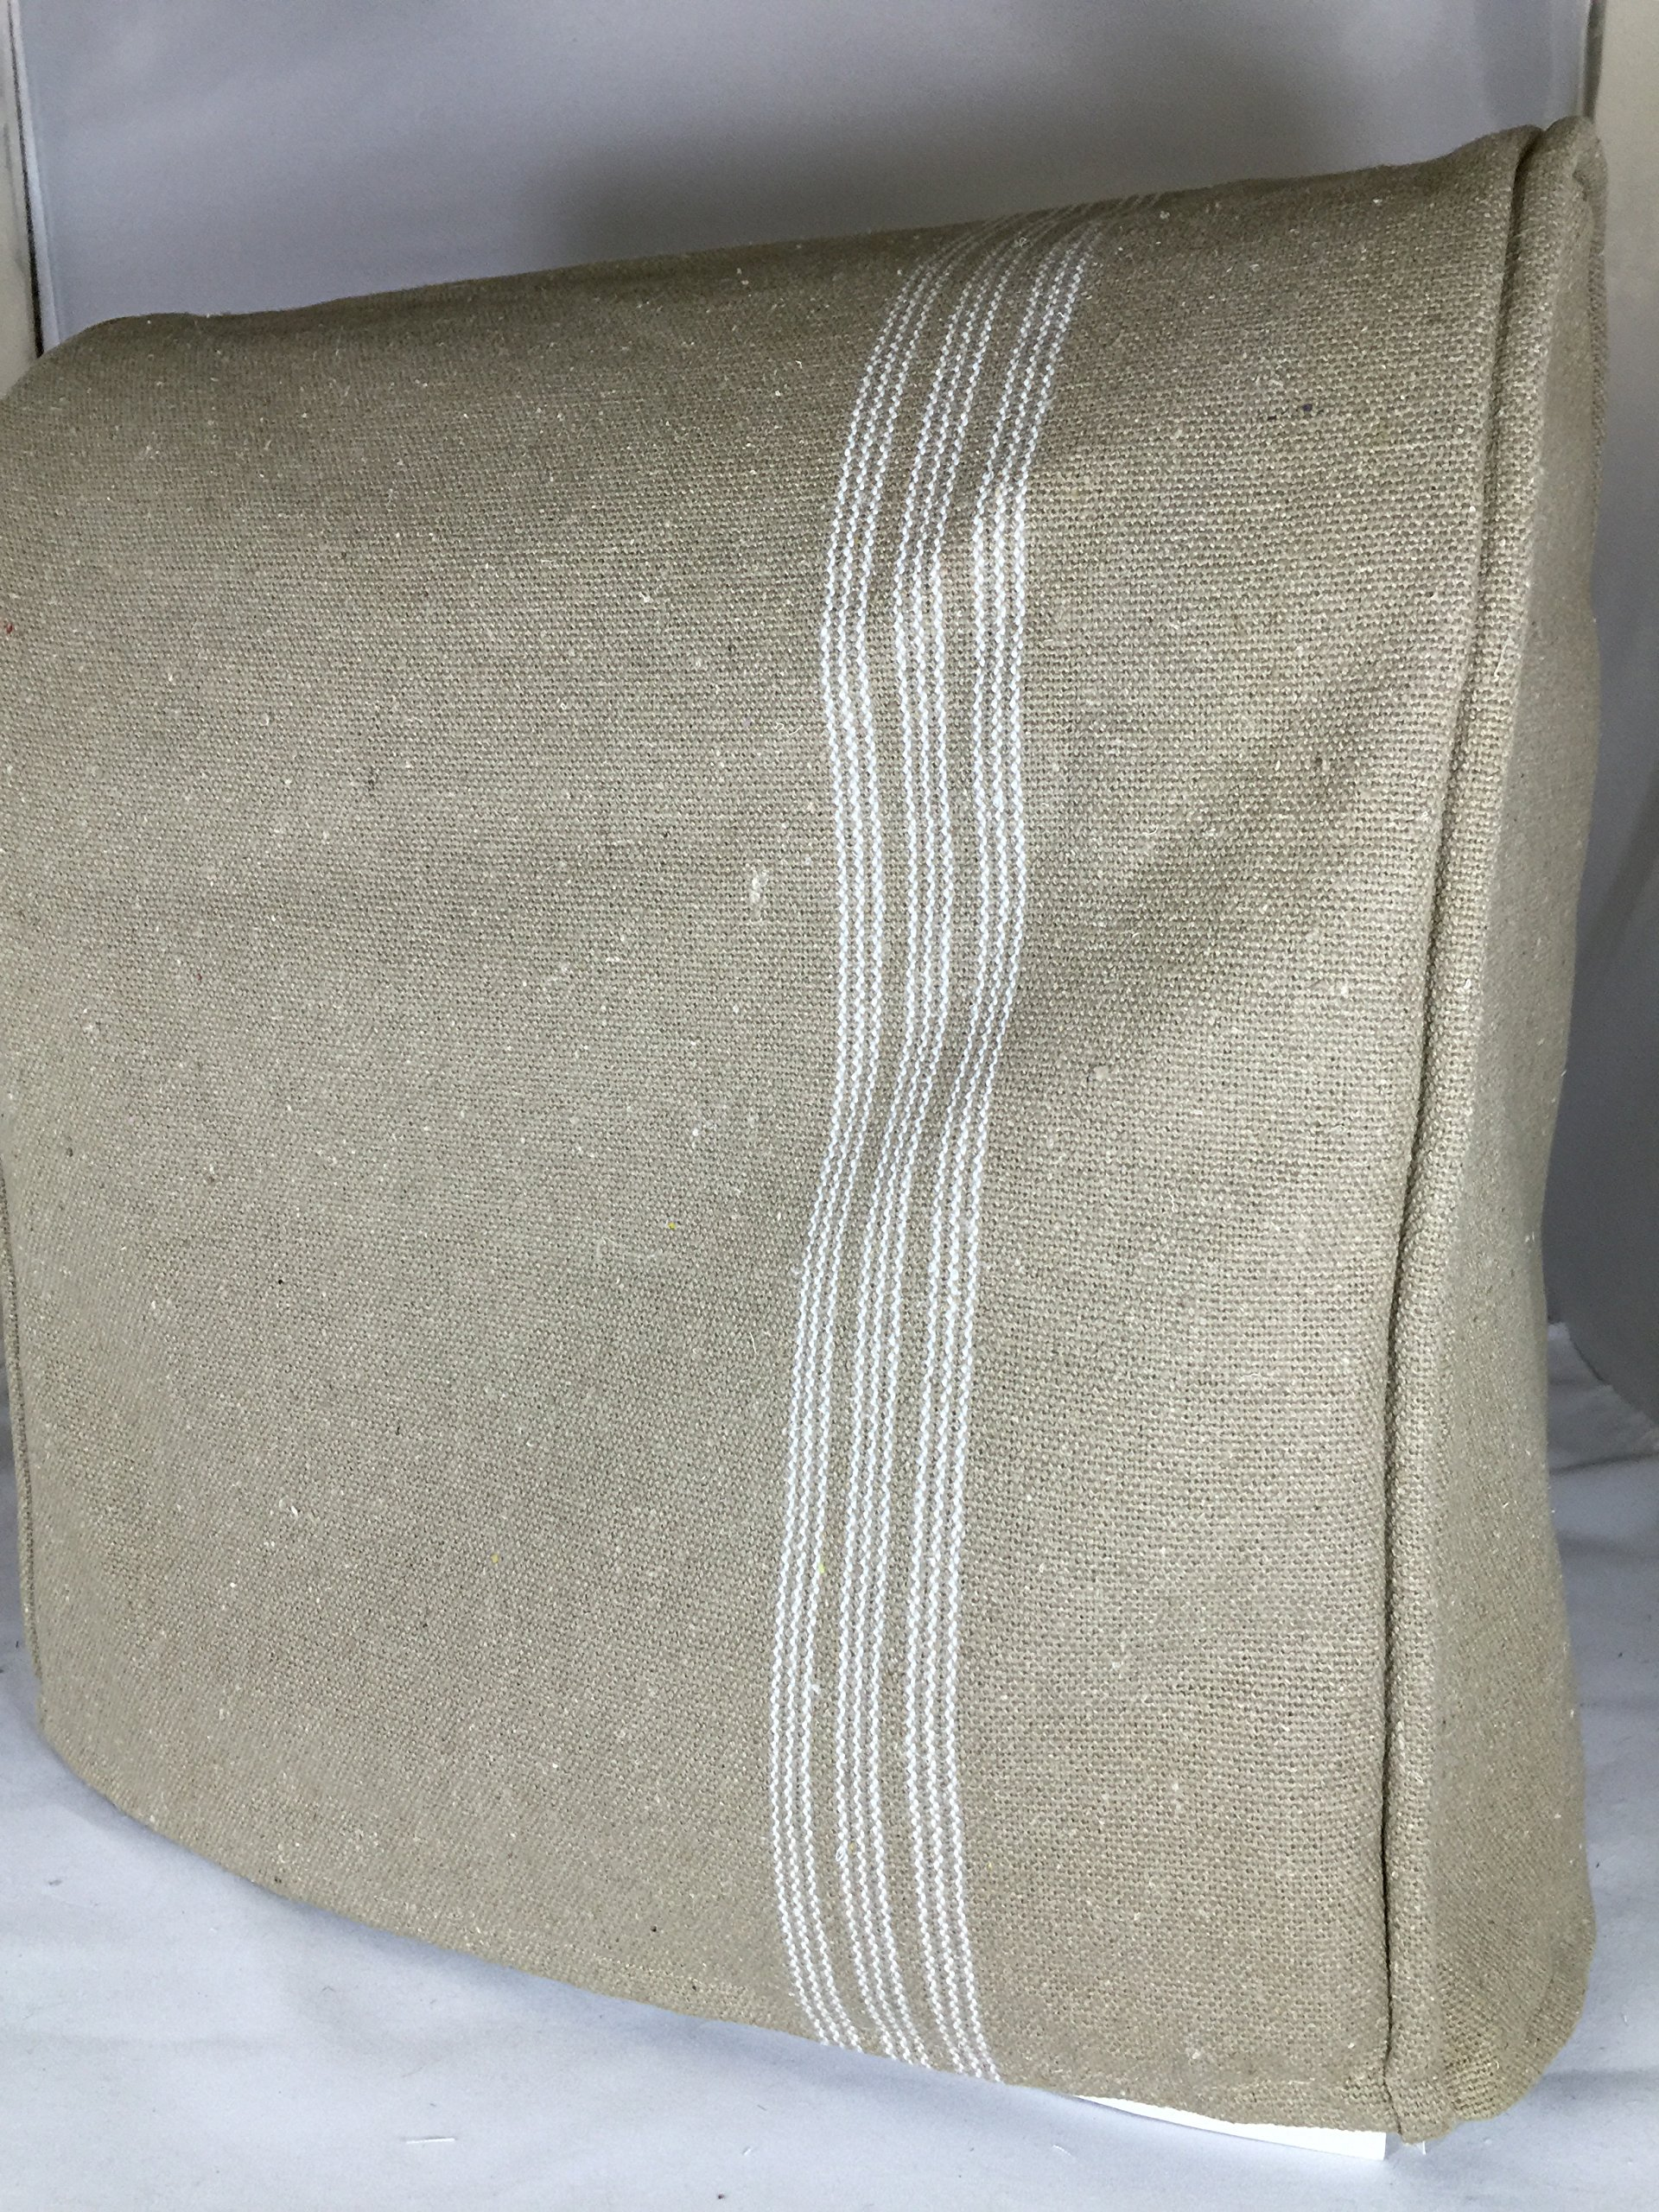 Lift Head KitchenAid Cover, Brown Feedsack